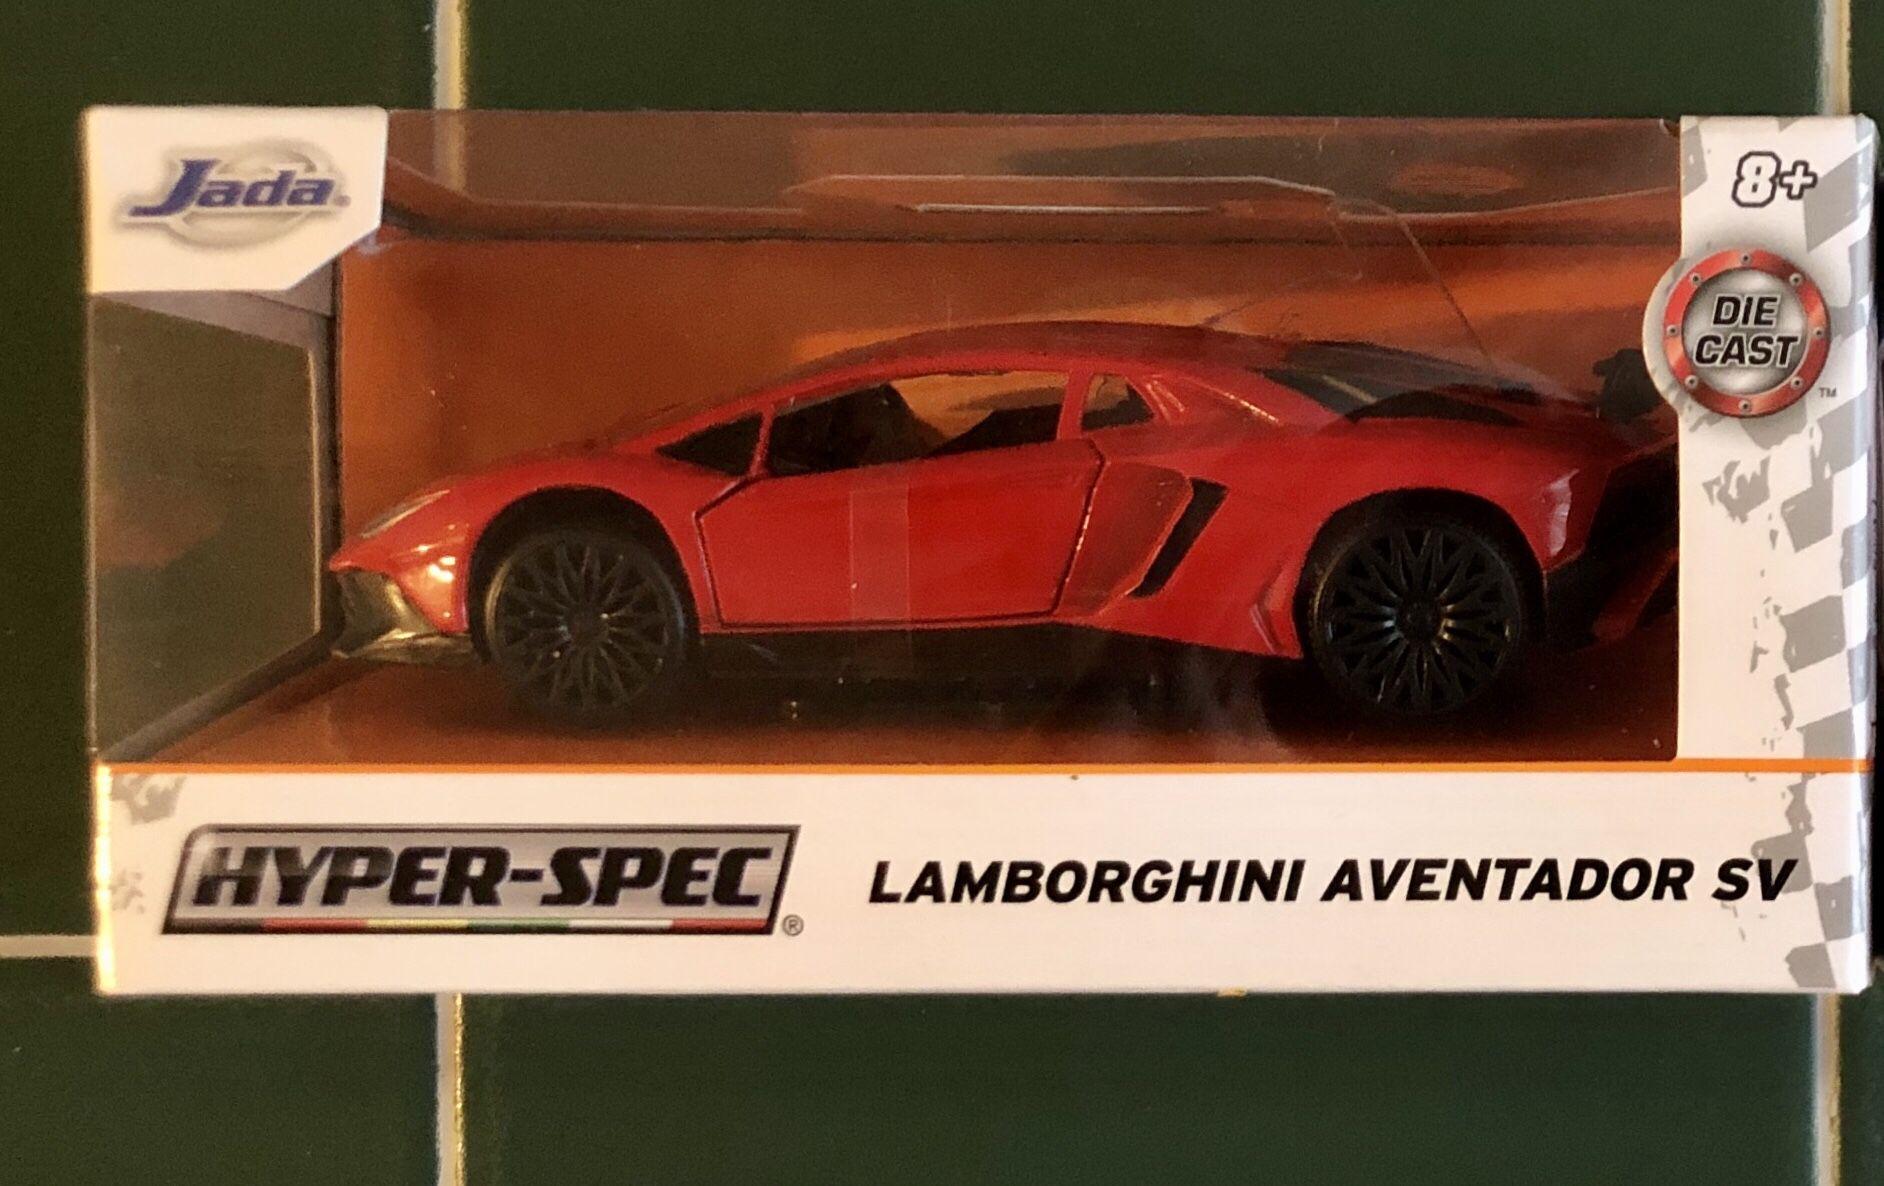 $17 Jada hyper spec Red lamborghini